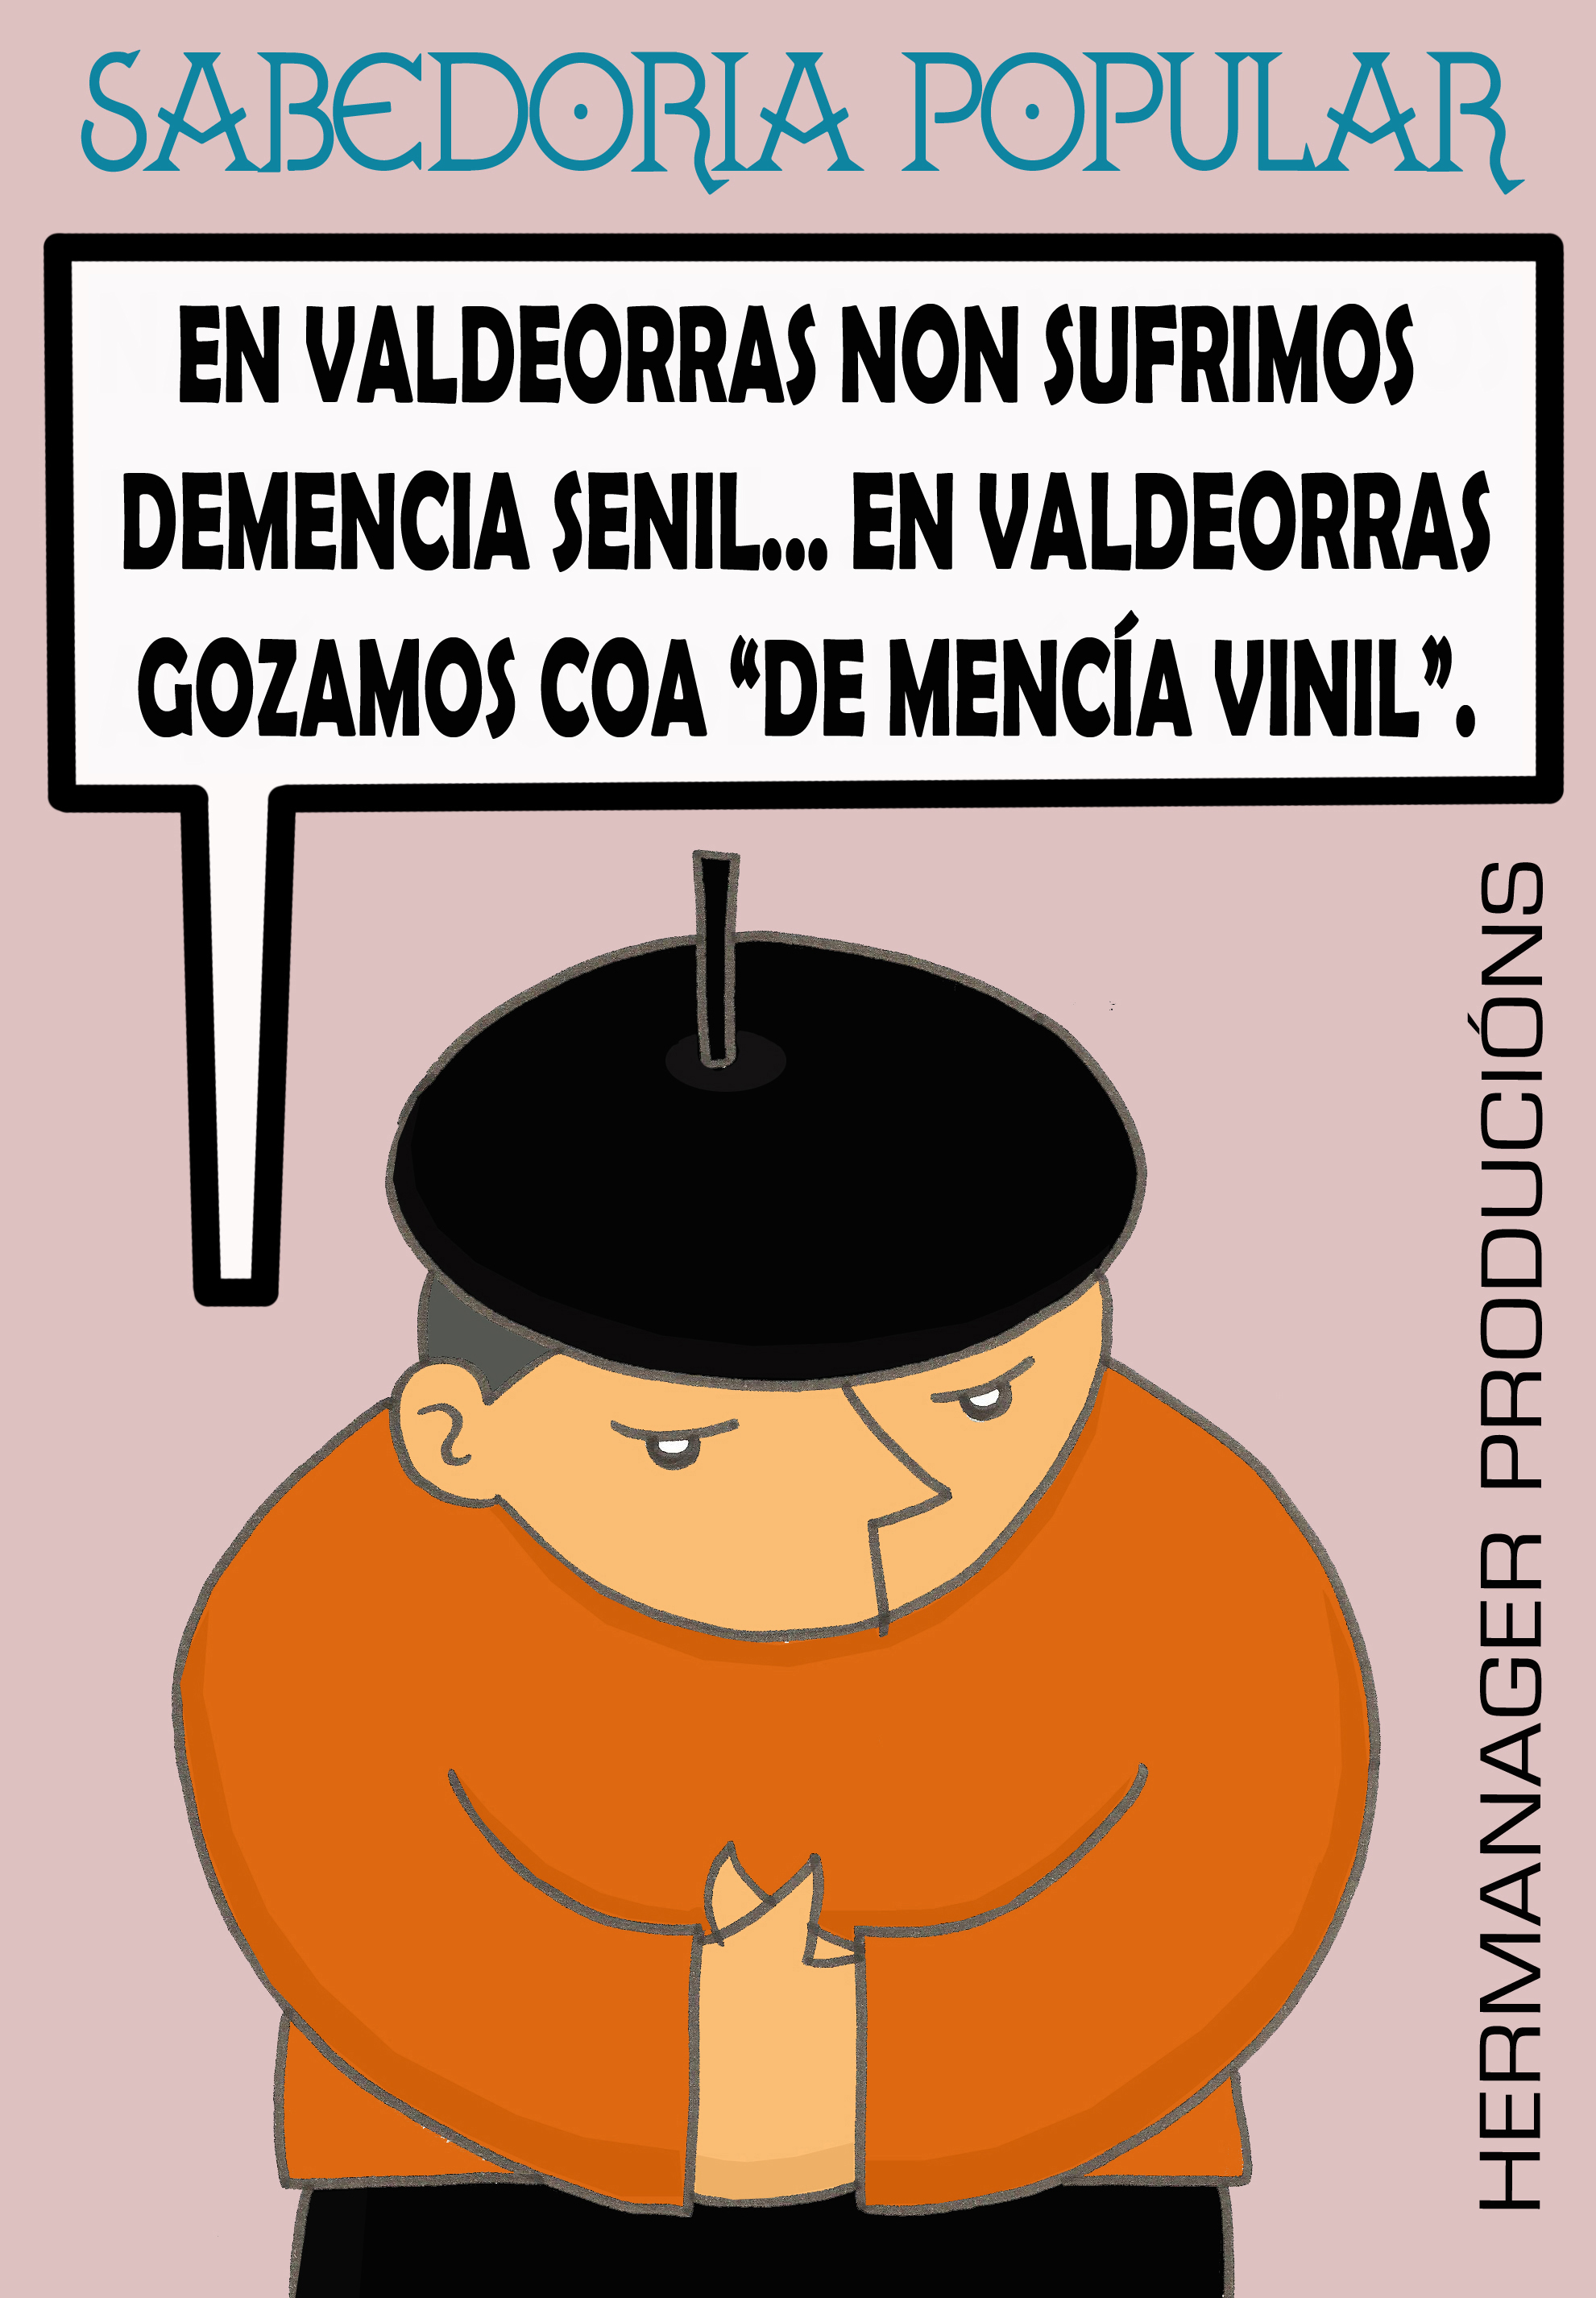 DEMENCIA VINIL